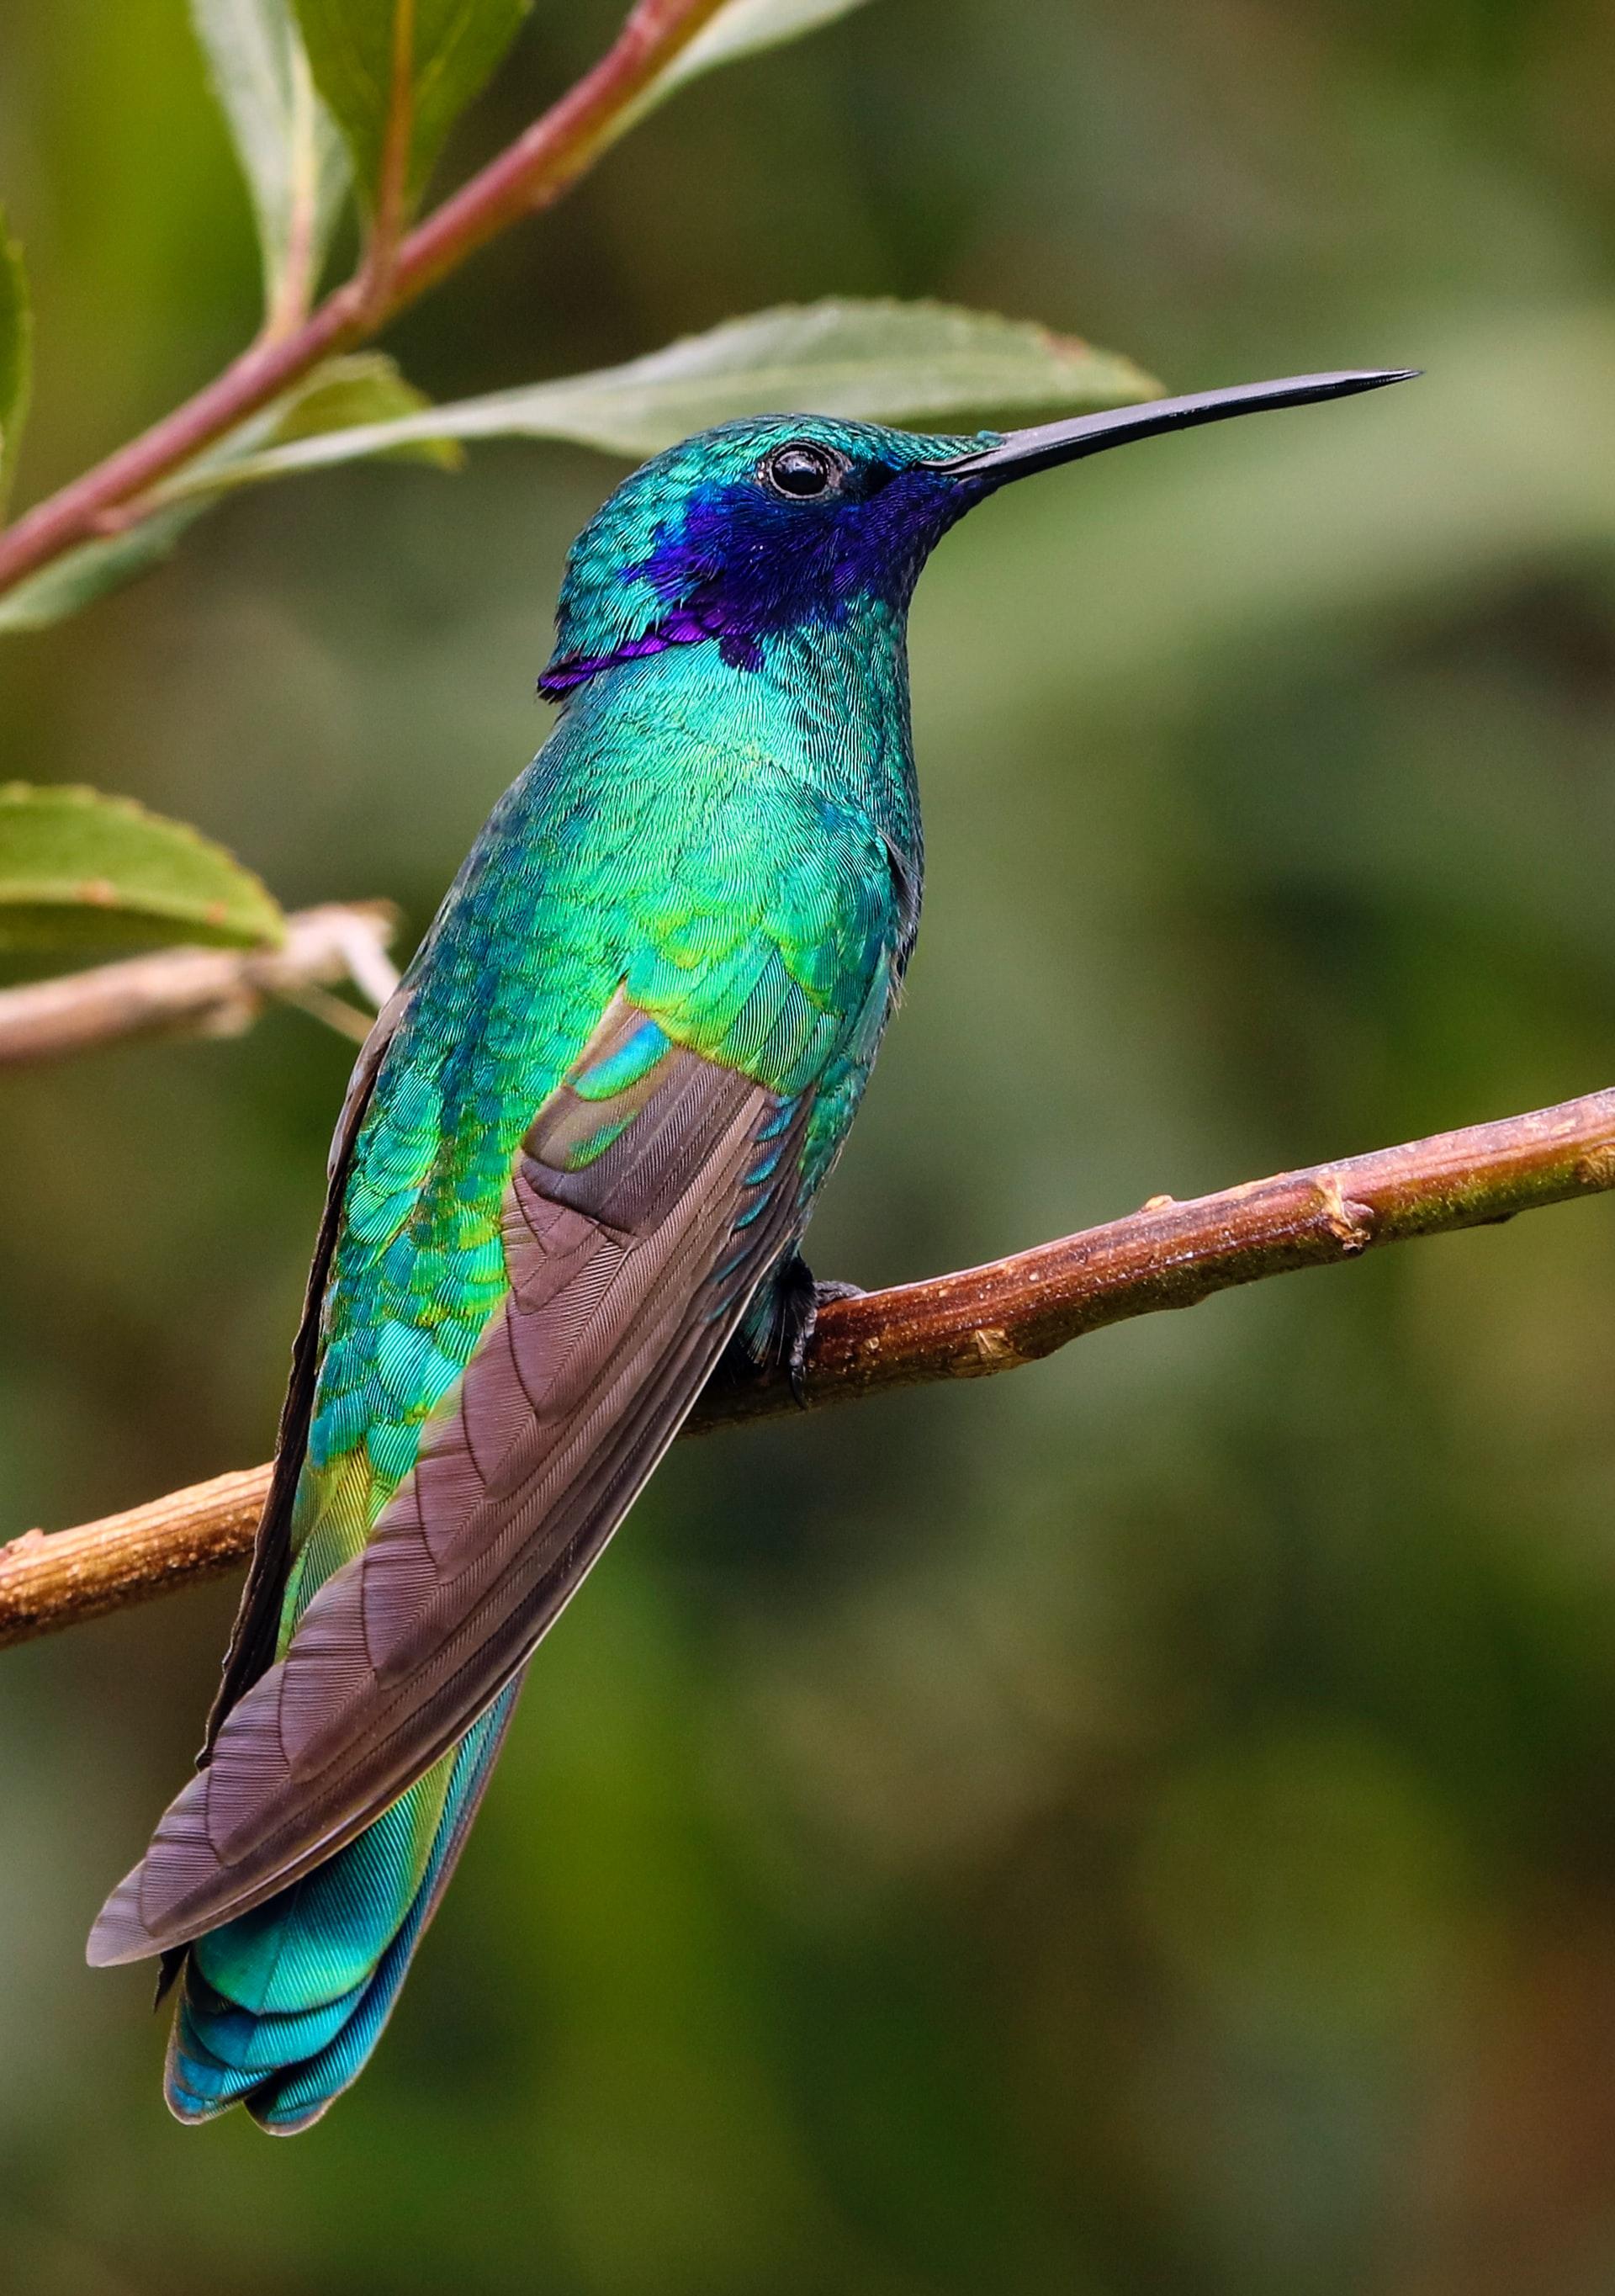 picture of hummingbird www.atozmomm.com